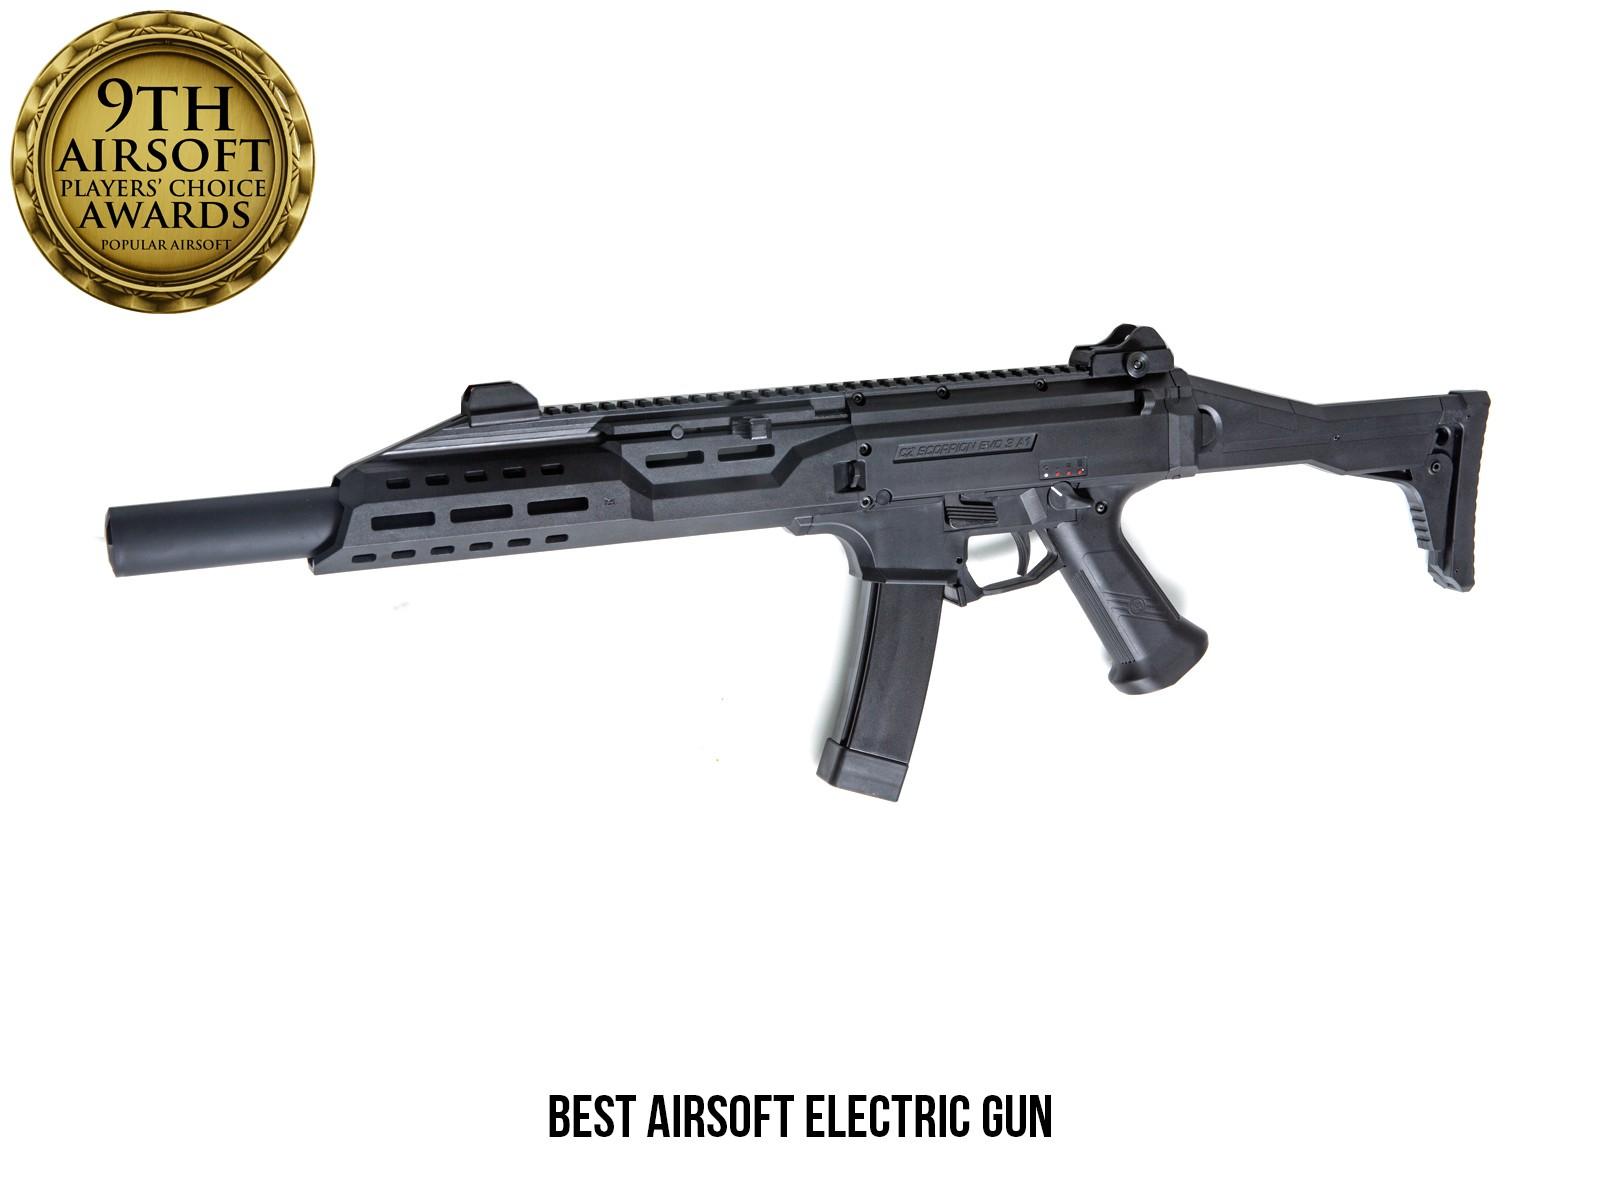 ASG - Fusil d'assaut Scorpion EVO 3 A1 + silencieux B.E.T. AEG - Noir (1.7 joules)